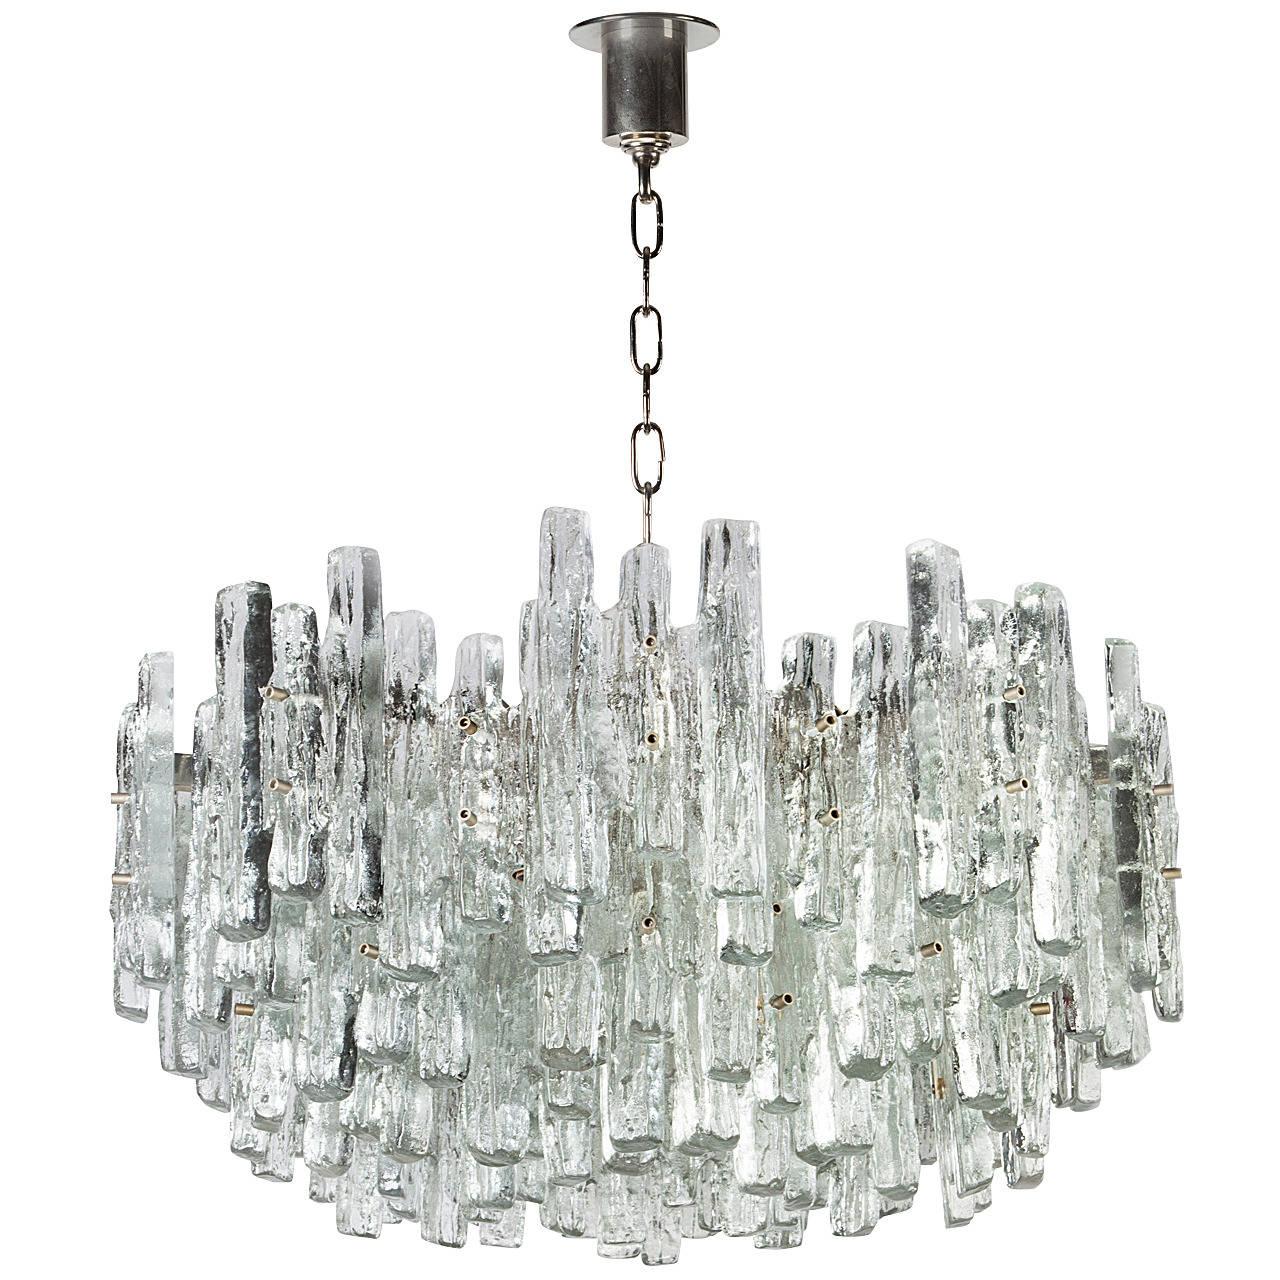 Large Nickel J.T. Kalmar Chandelier with Ice-Style Austrian Crystal Prisms